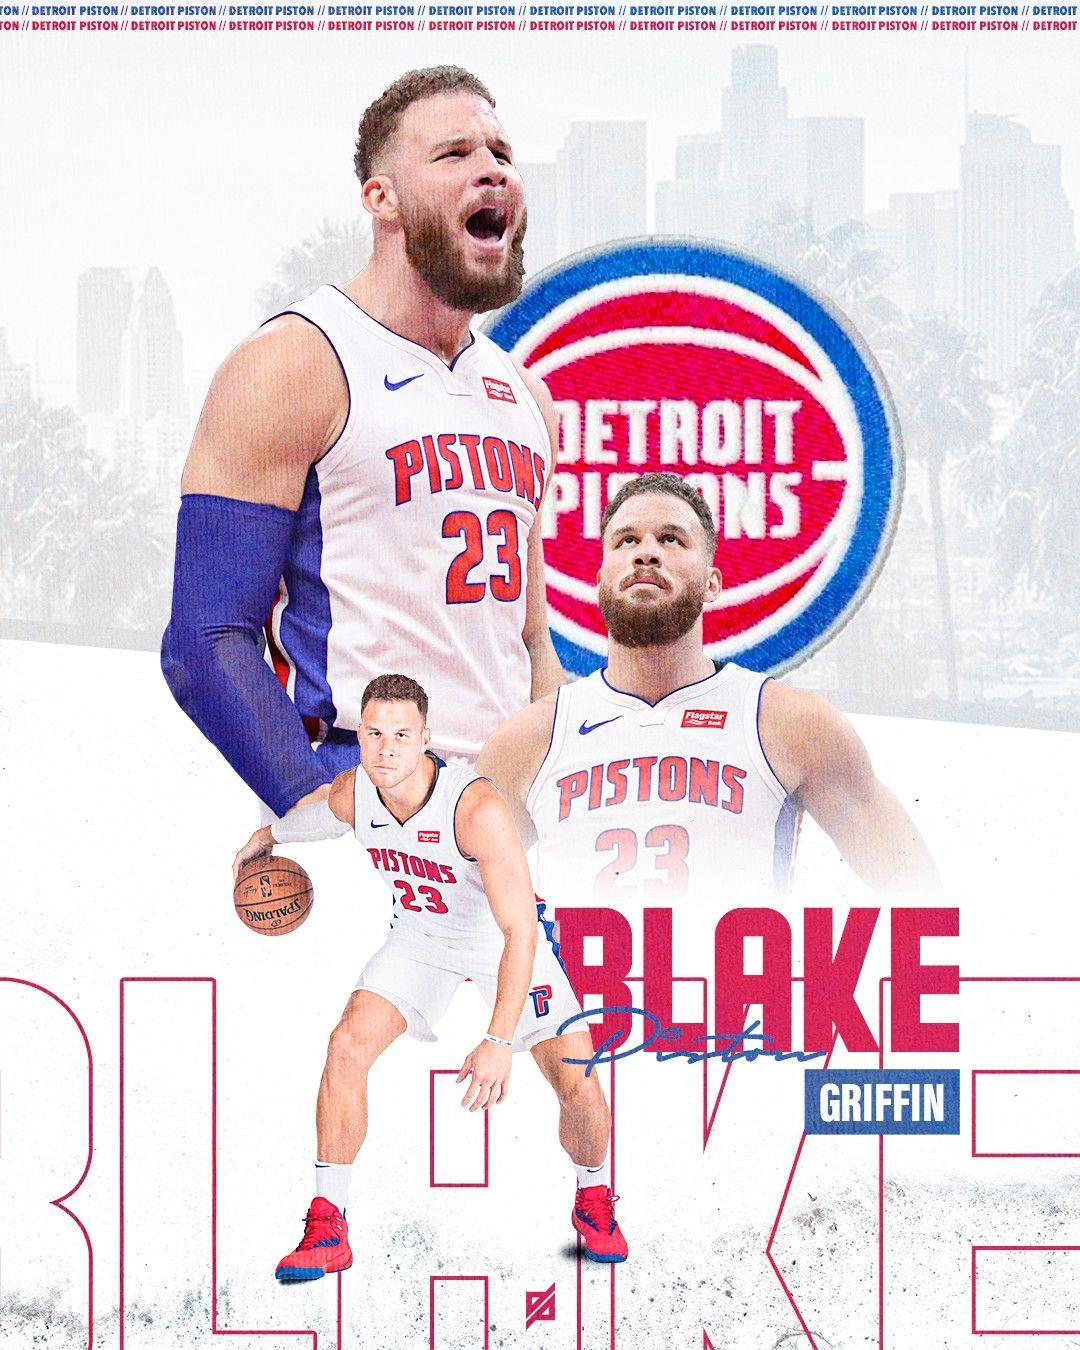 Pin By Djebril Design On Poster Design Sports Design Inspiration Sports Design Blake Griffin